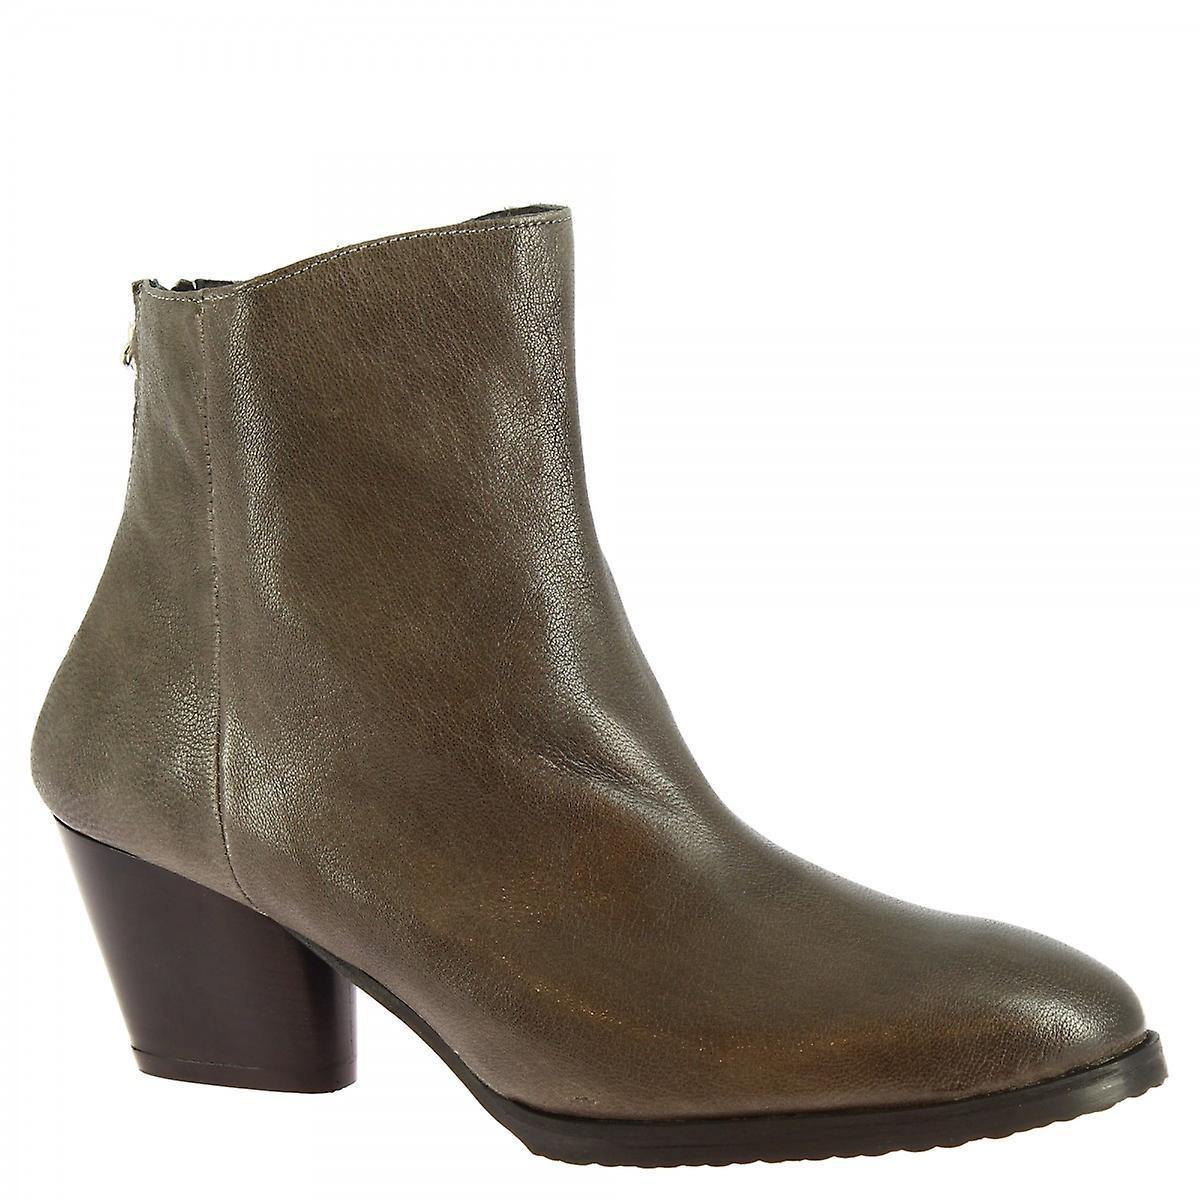 Leonardo Shoes Women's handmade heels ankle boots gray calf leather back zip LW1ck